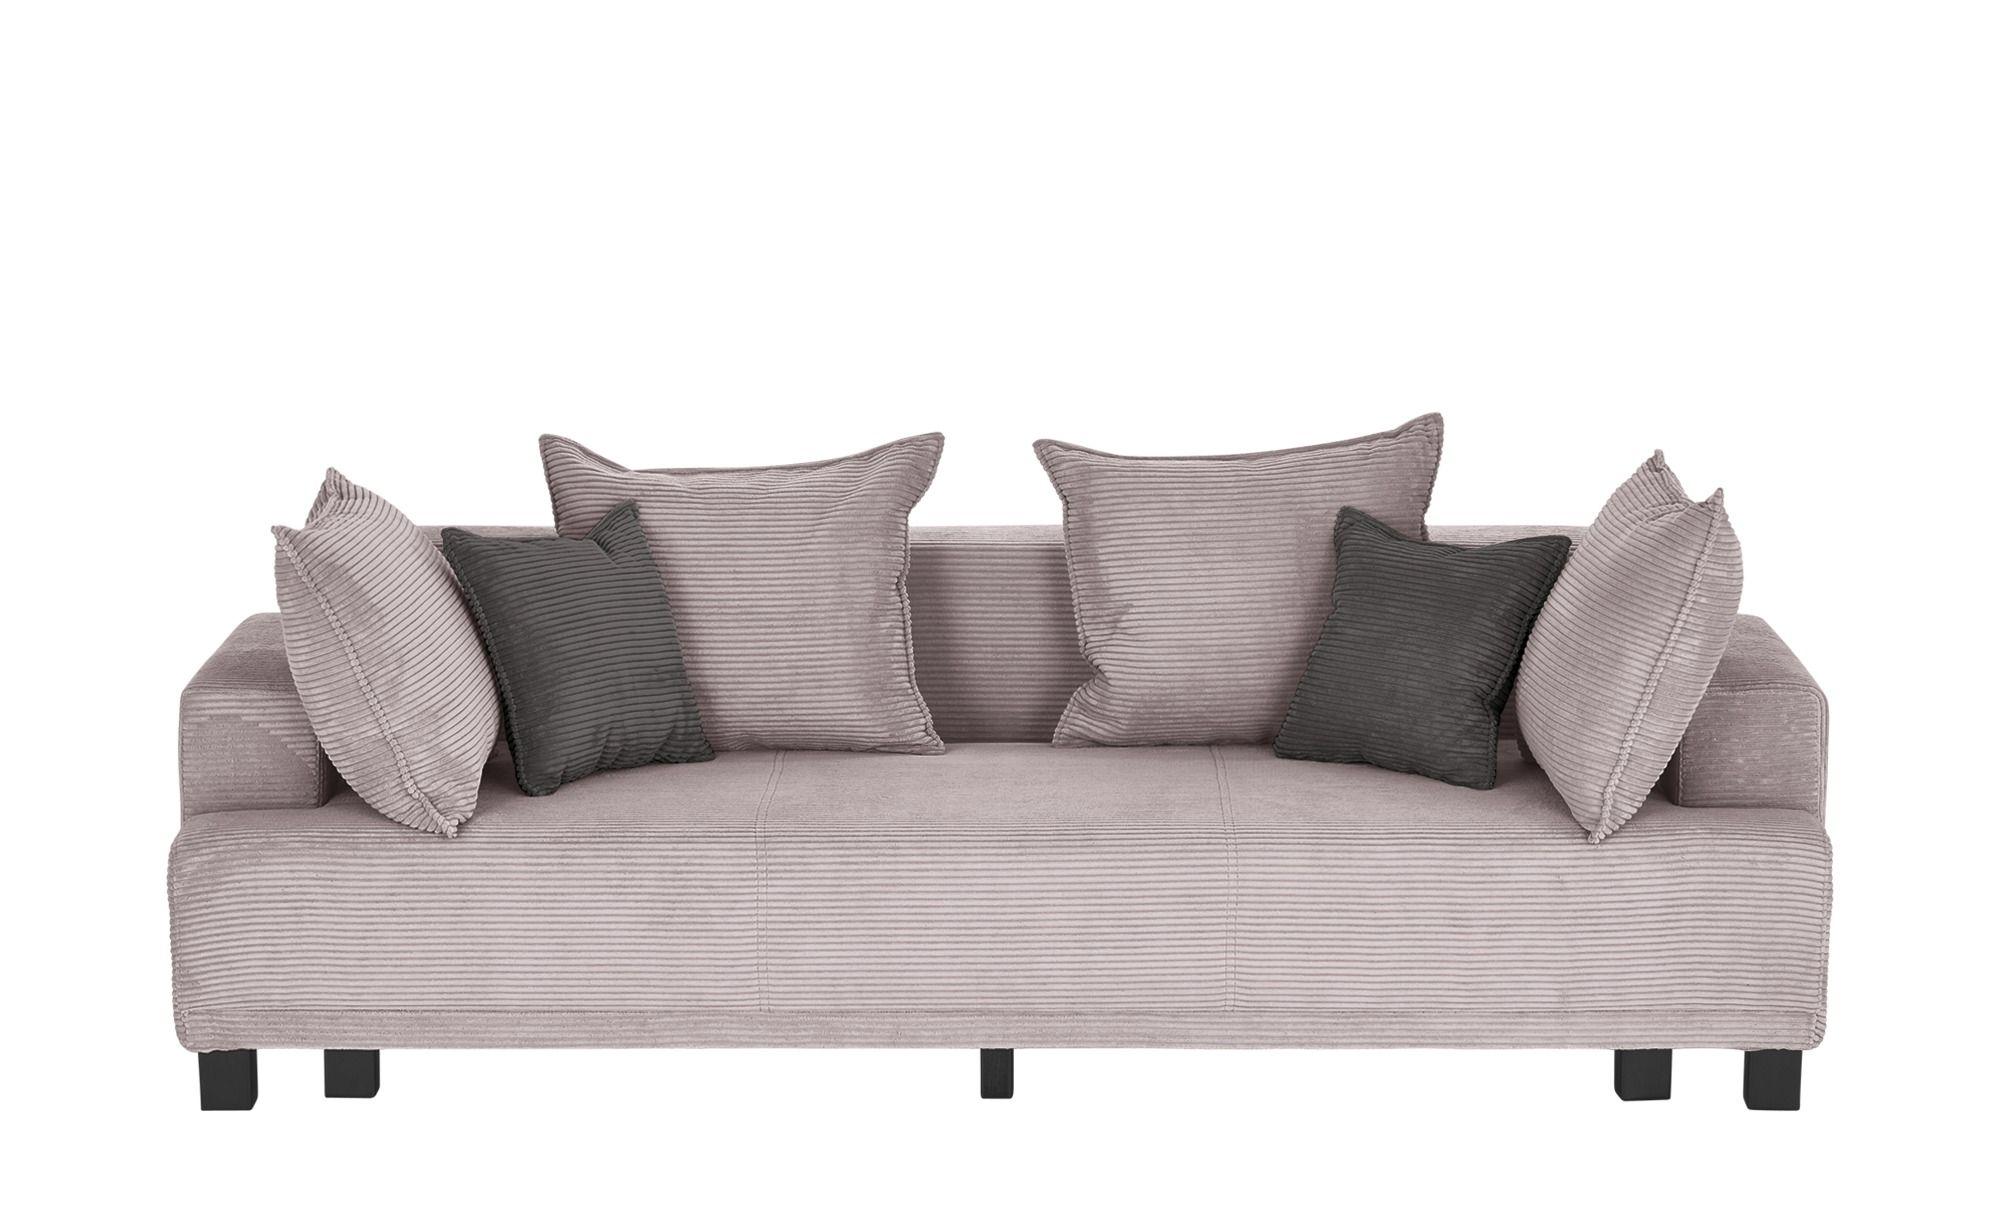 Design Sofa Kaufen Ecksofa Hudson 3 Wooden Sofa Designs For Small Living Rooms White Chesterfield Sofa Nz Ledersofa Braun V Mit Bildern Sofa Schlafsofa Sofa Design